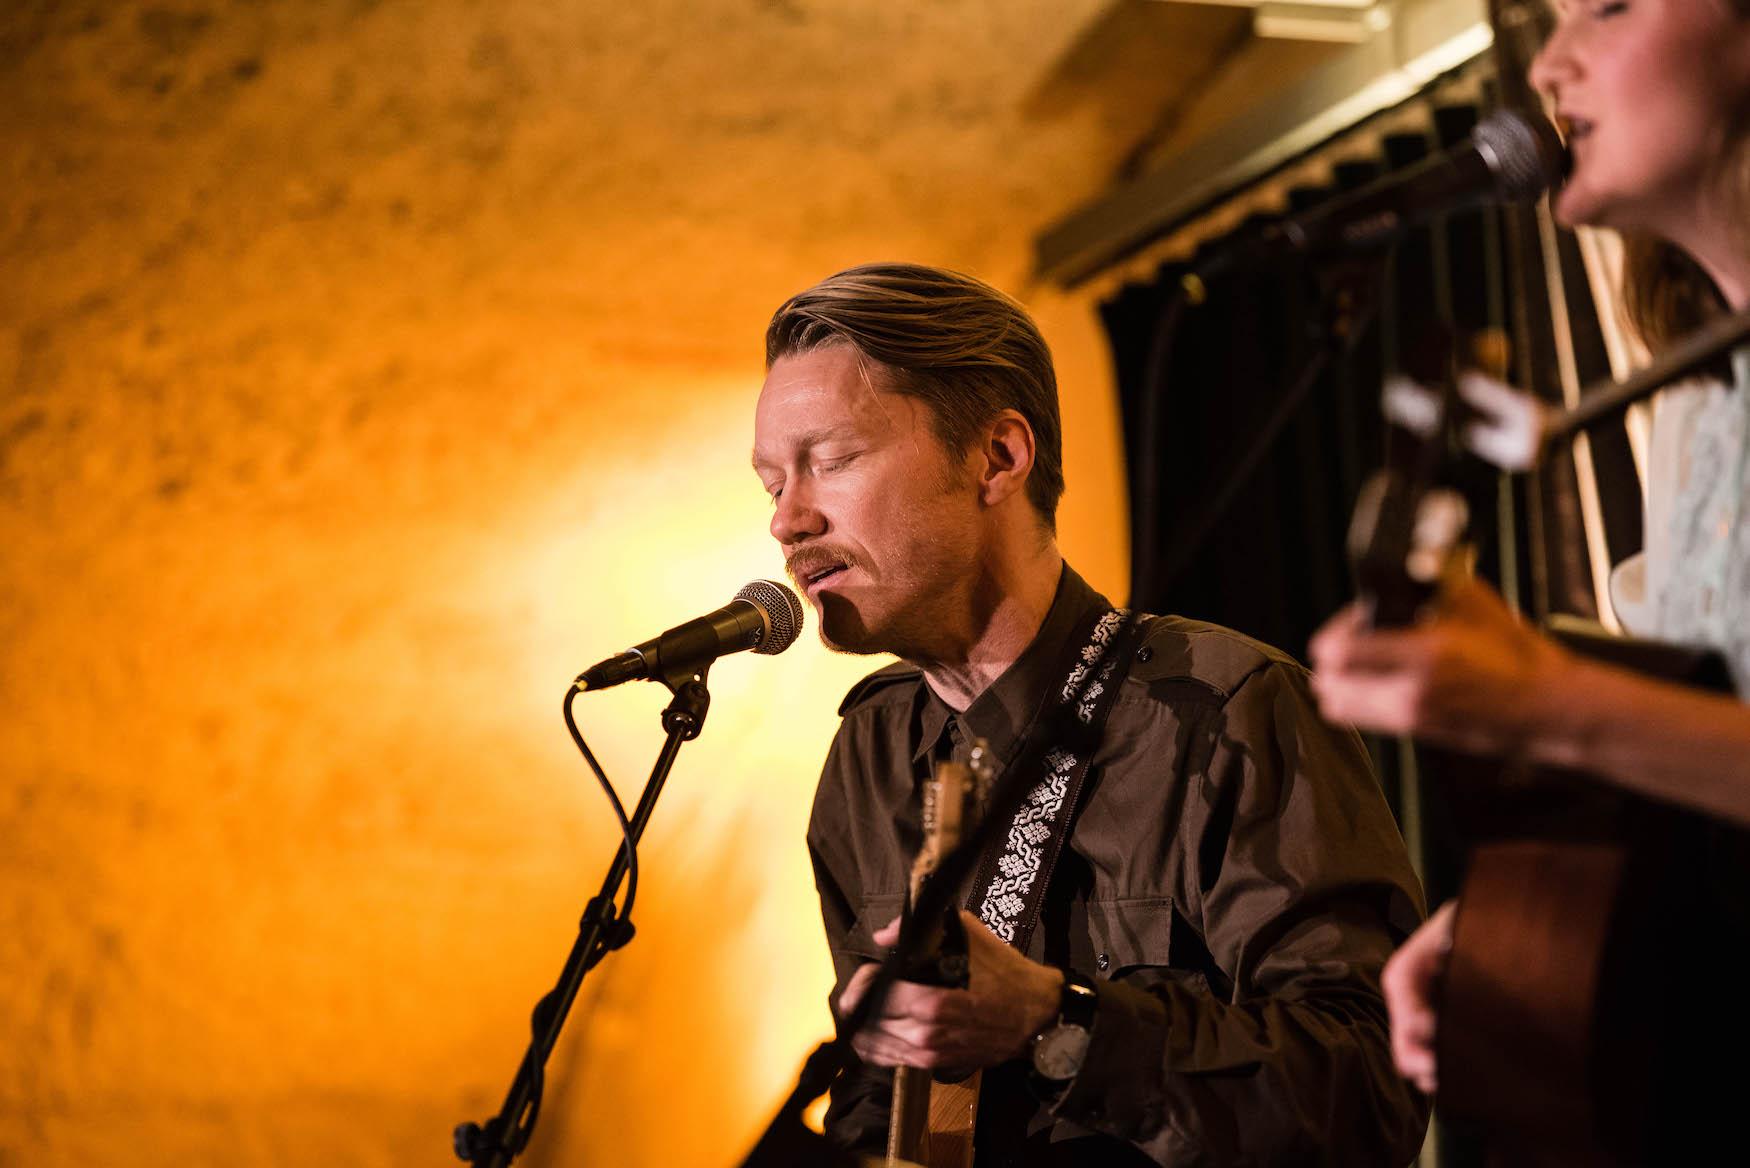 Melodischer Bluegrass aus Norwegen